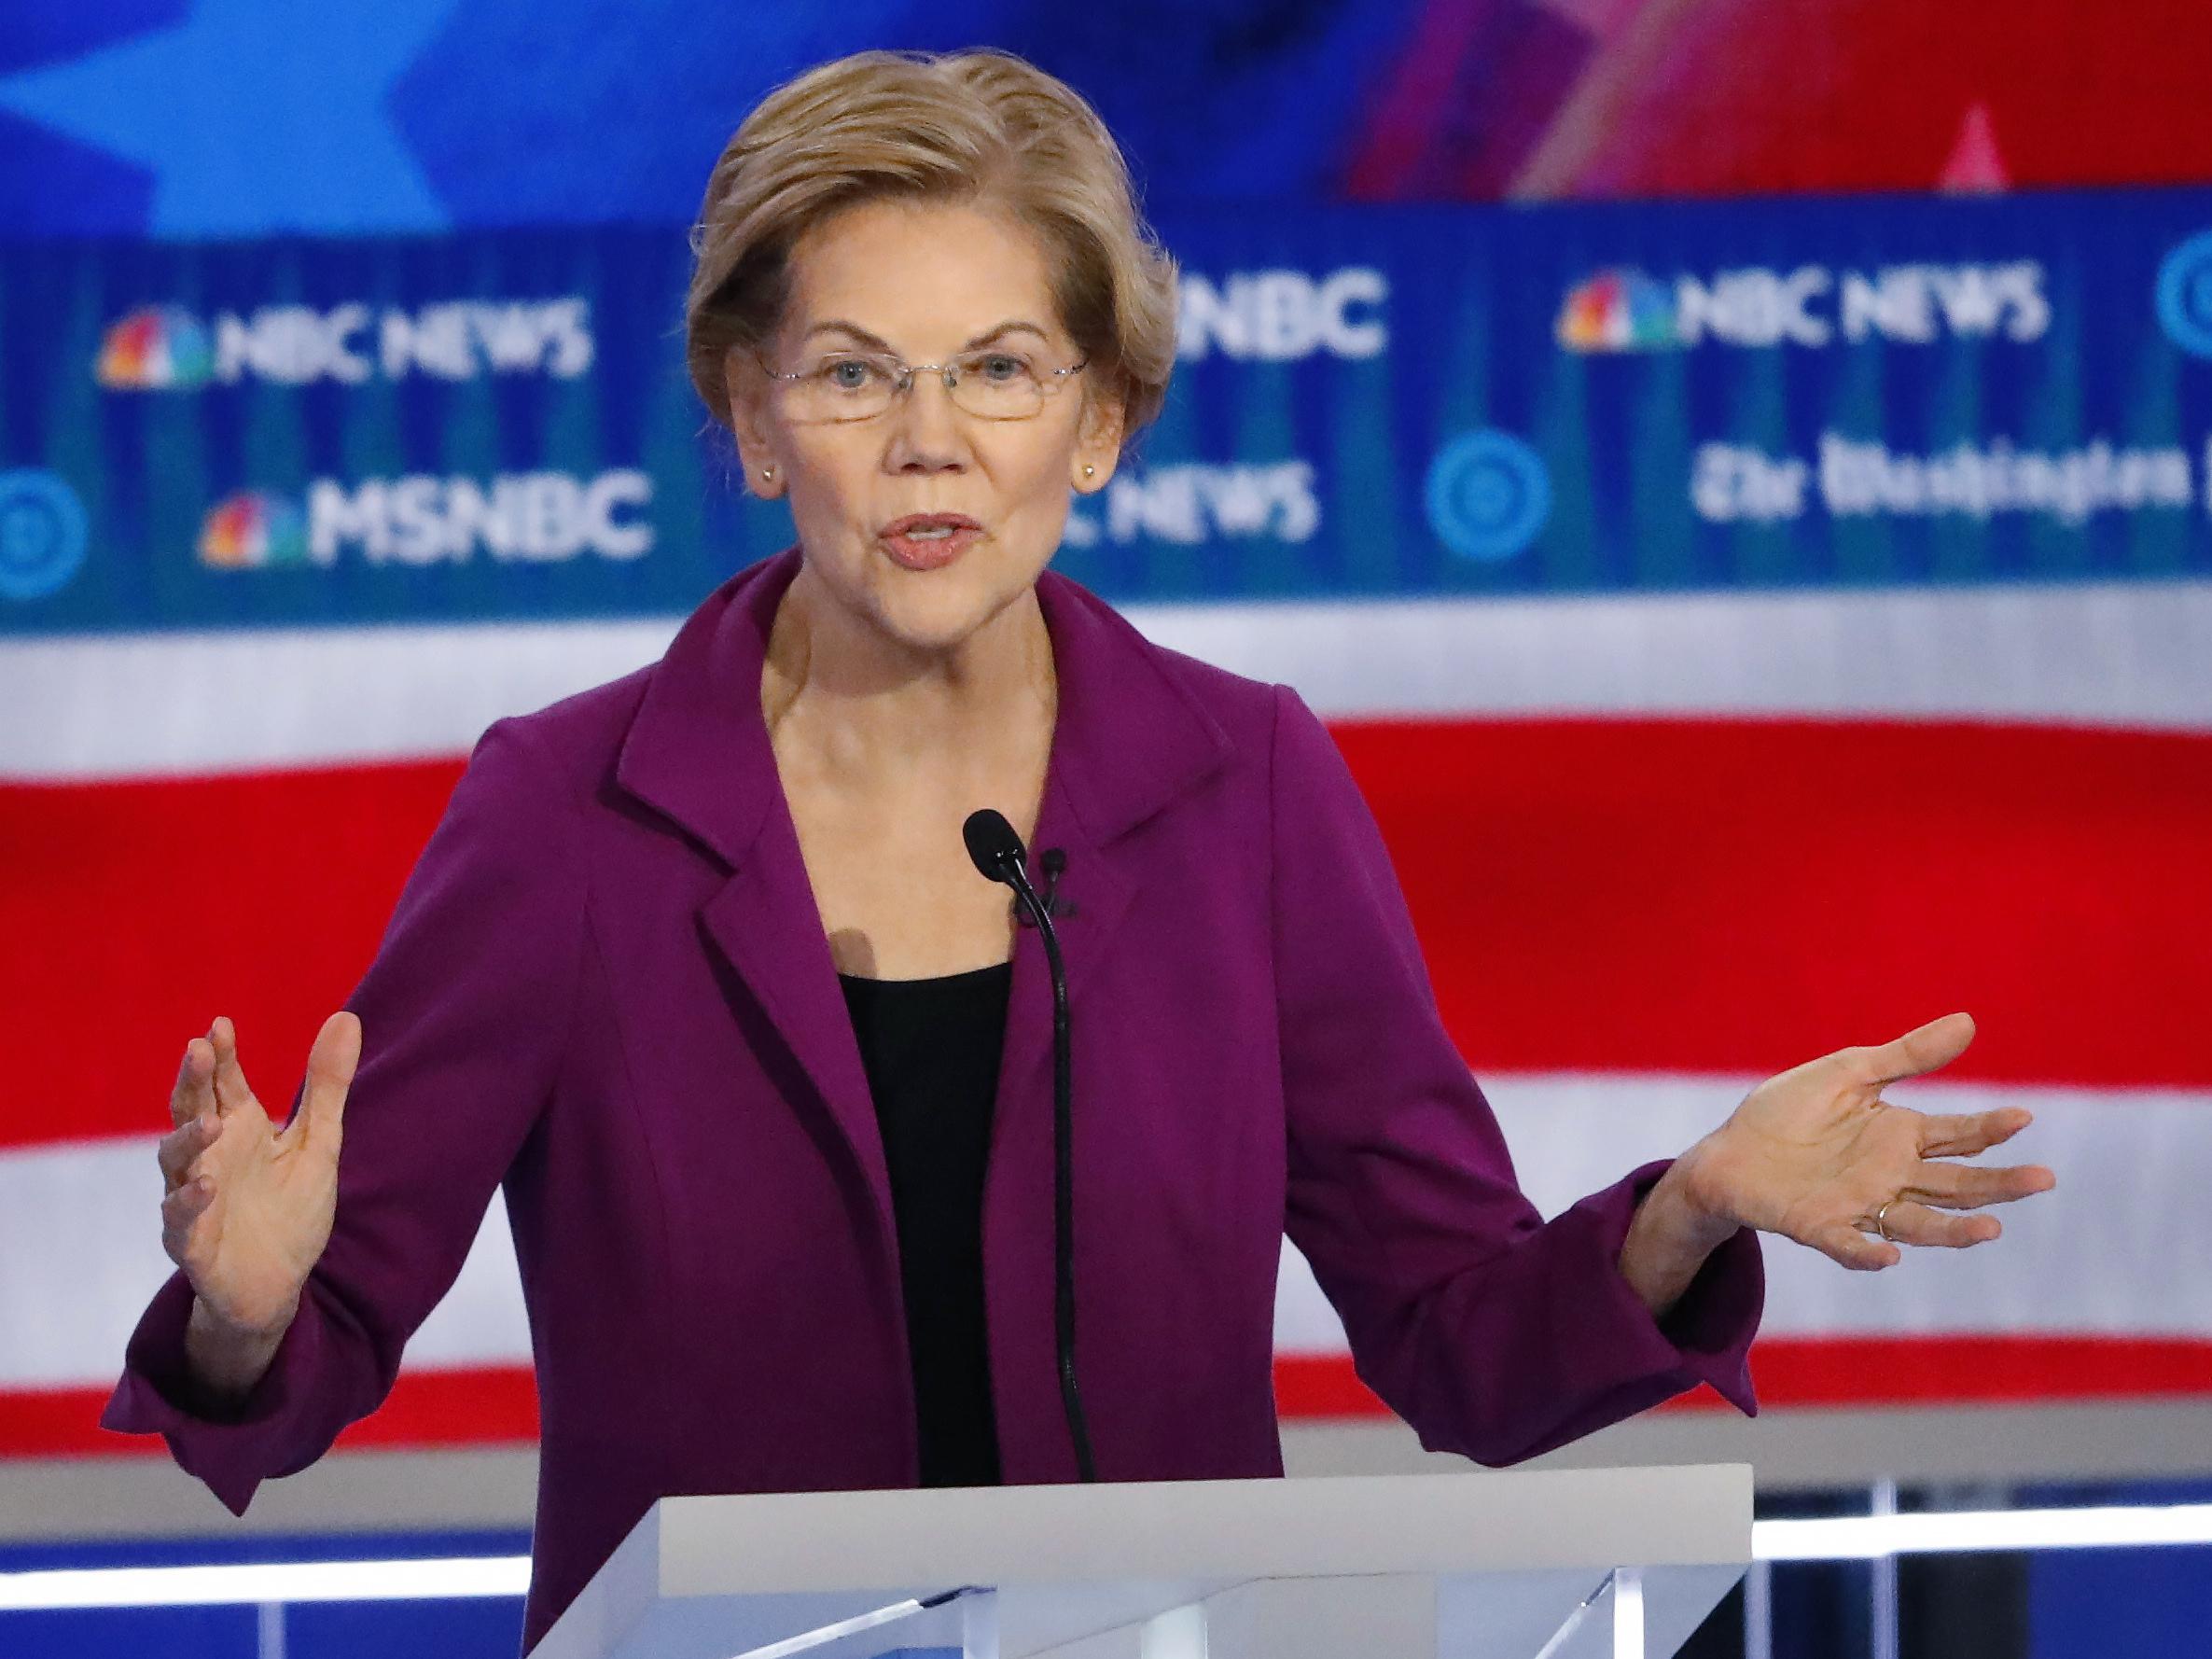 All 7 Democratic Candidates Scheduled To Debate Threaten To Skip Over Labor Dispute